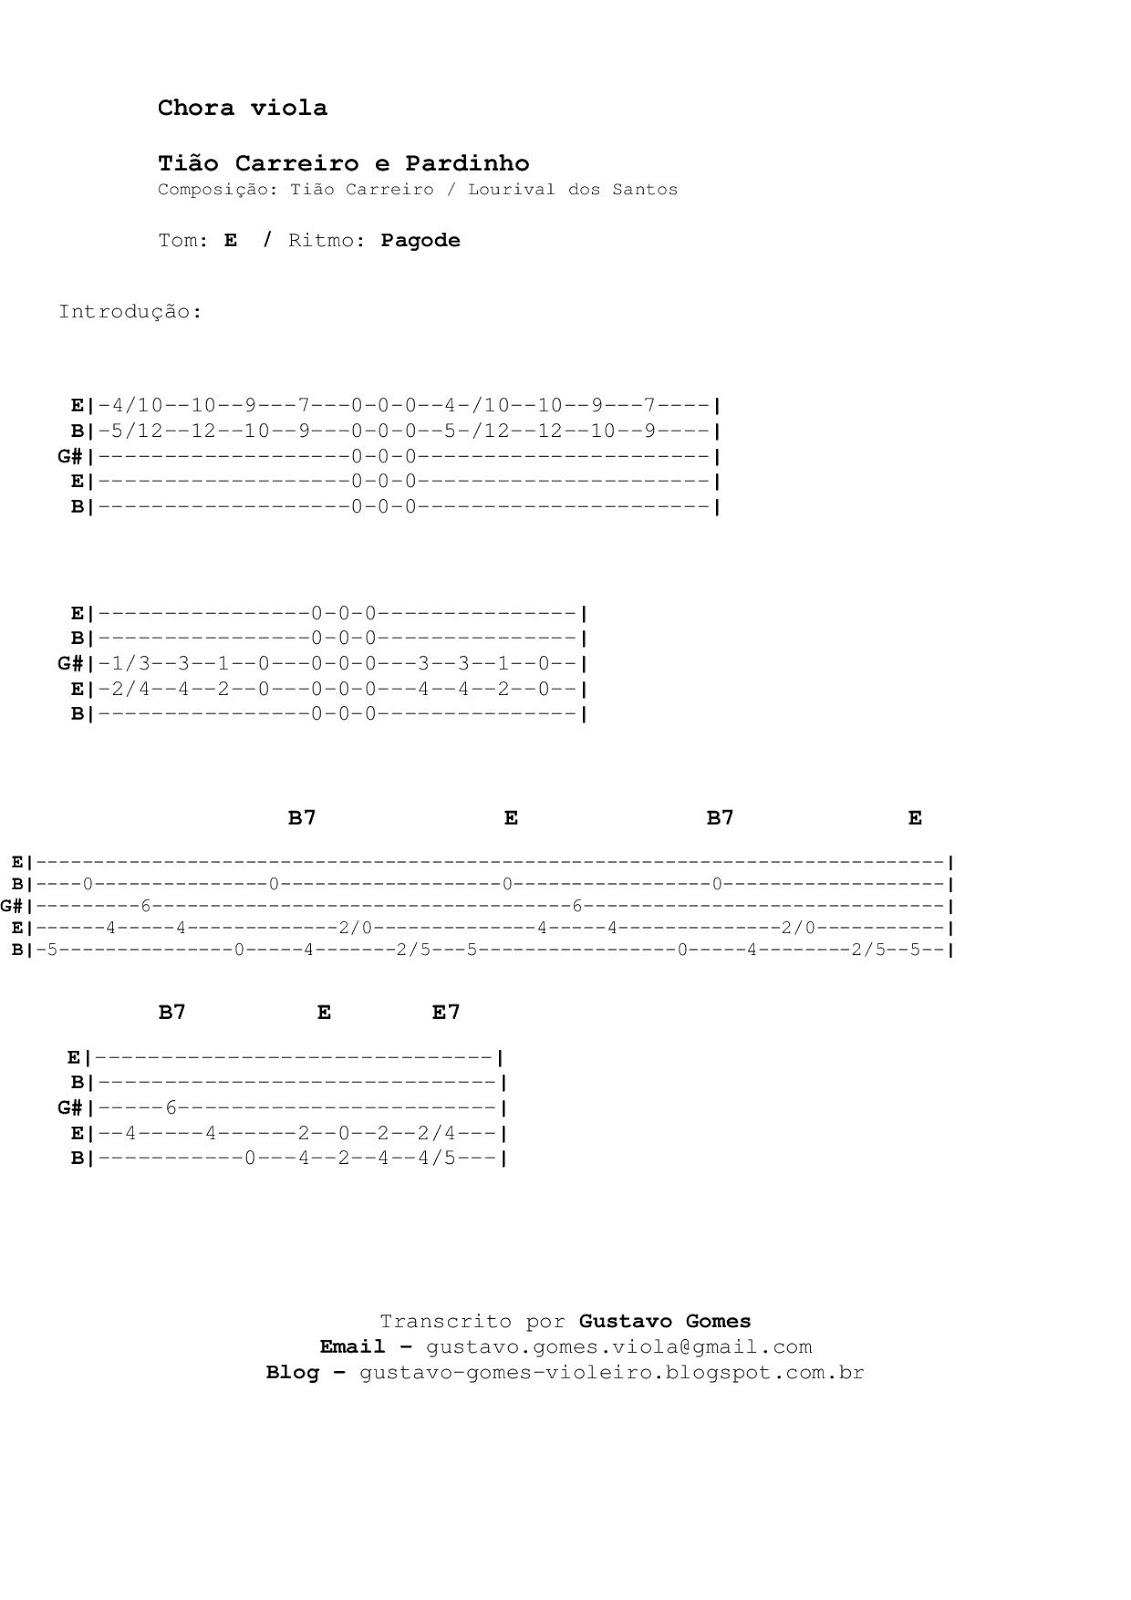 Gustavo Gomes Viola  Chora Viola 7f9bb40b36f